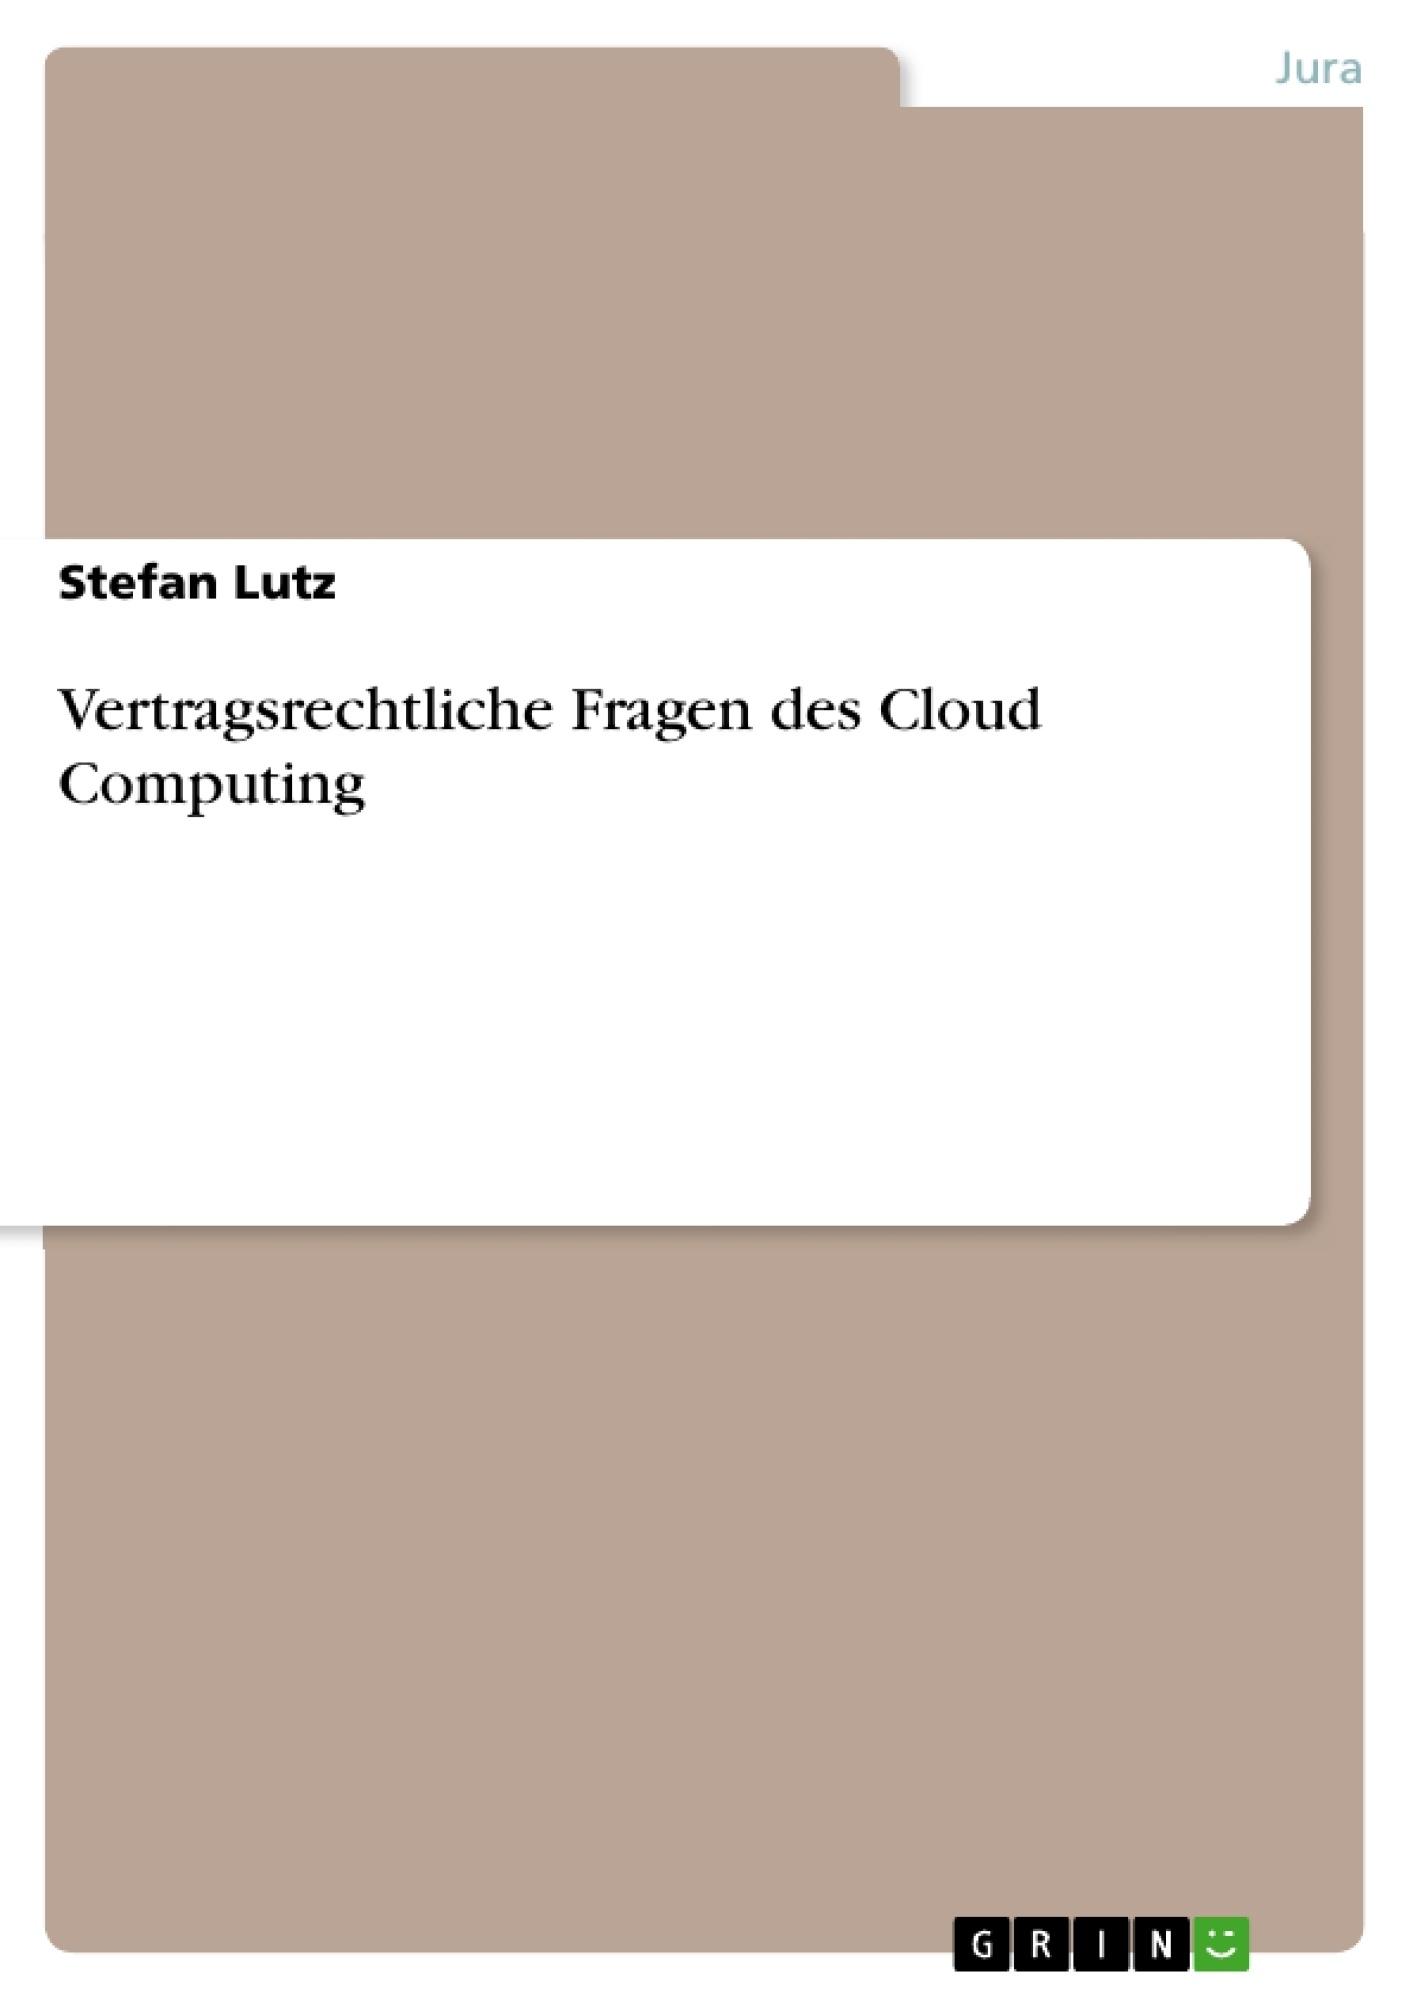 Titel: Vertragsrechtliche Fragen des  Cloud Computing